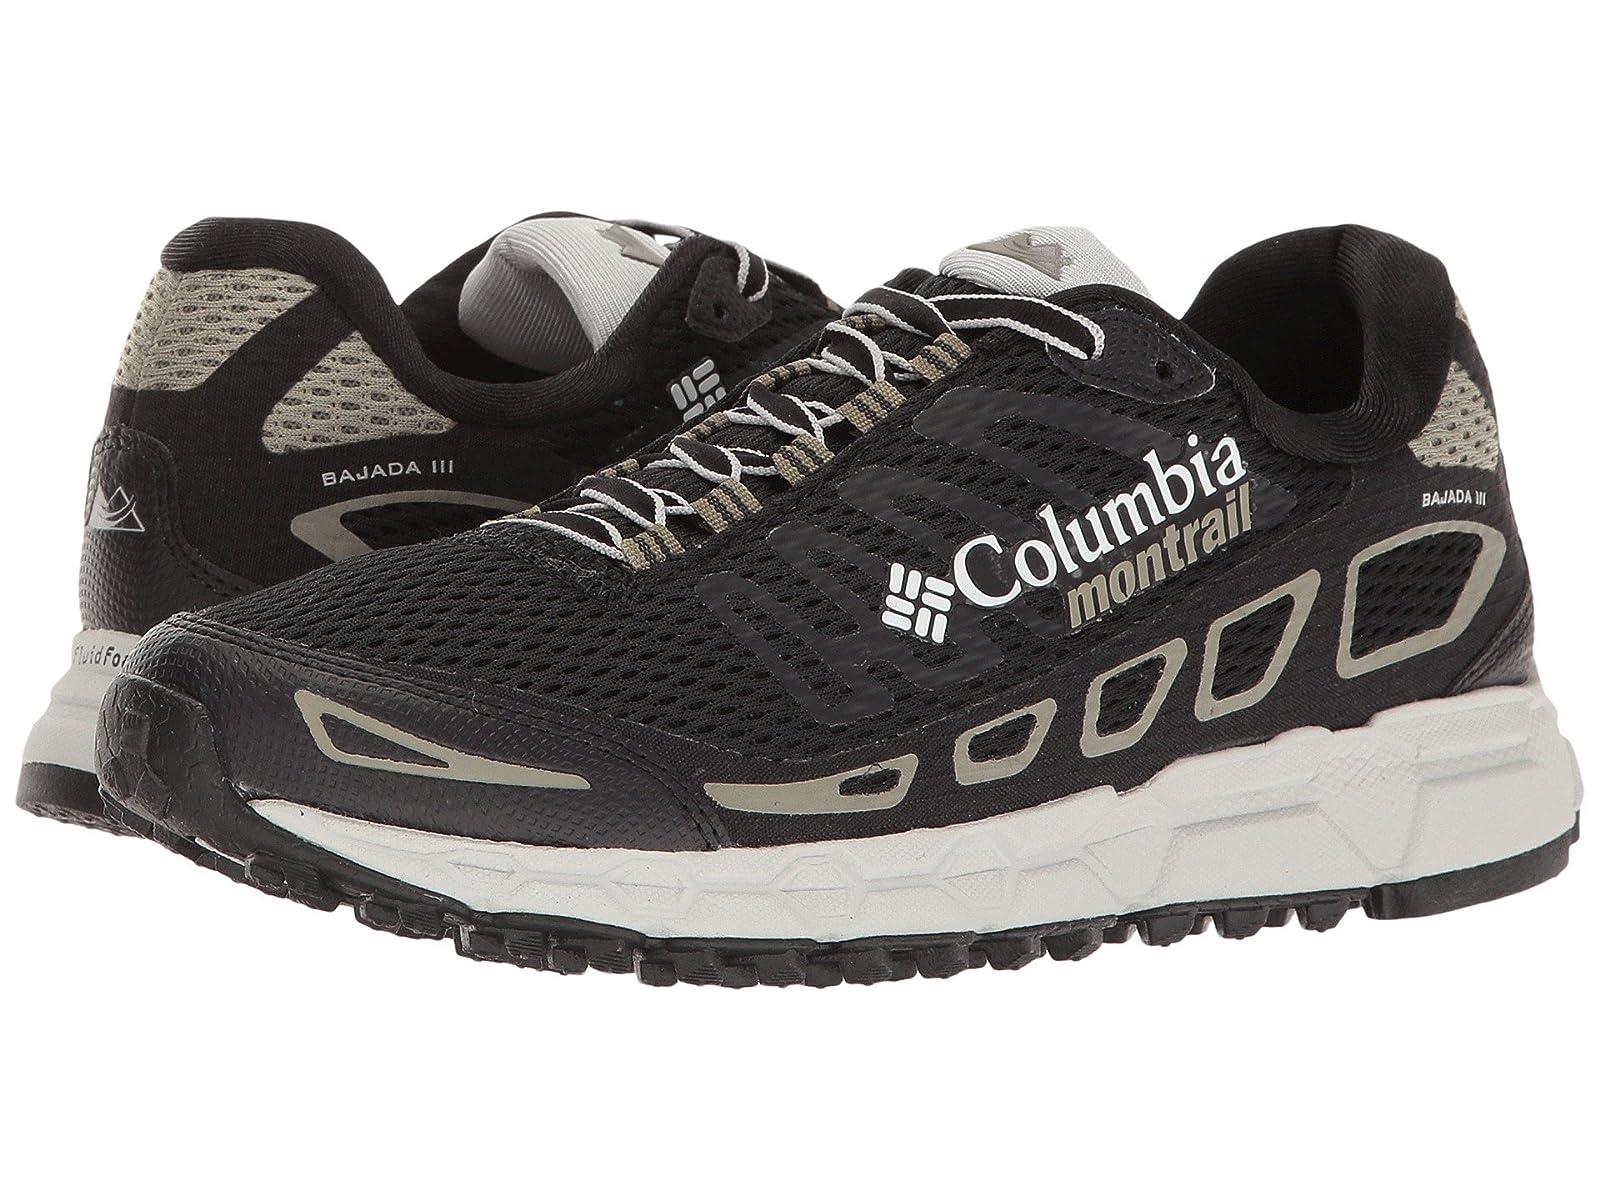 Columbia Bajada IIIAtmospheric grades have affordable shoes